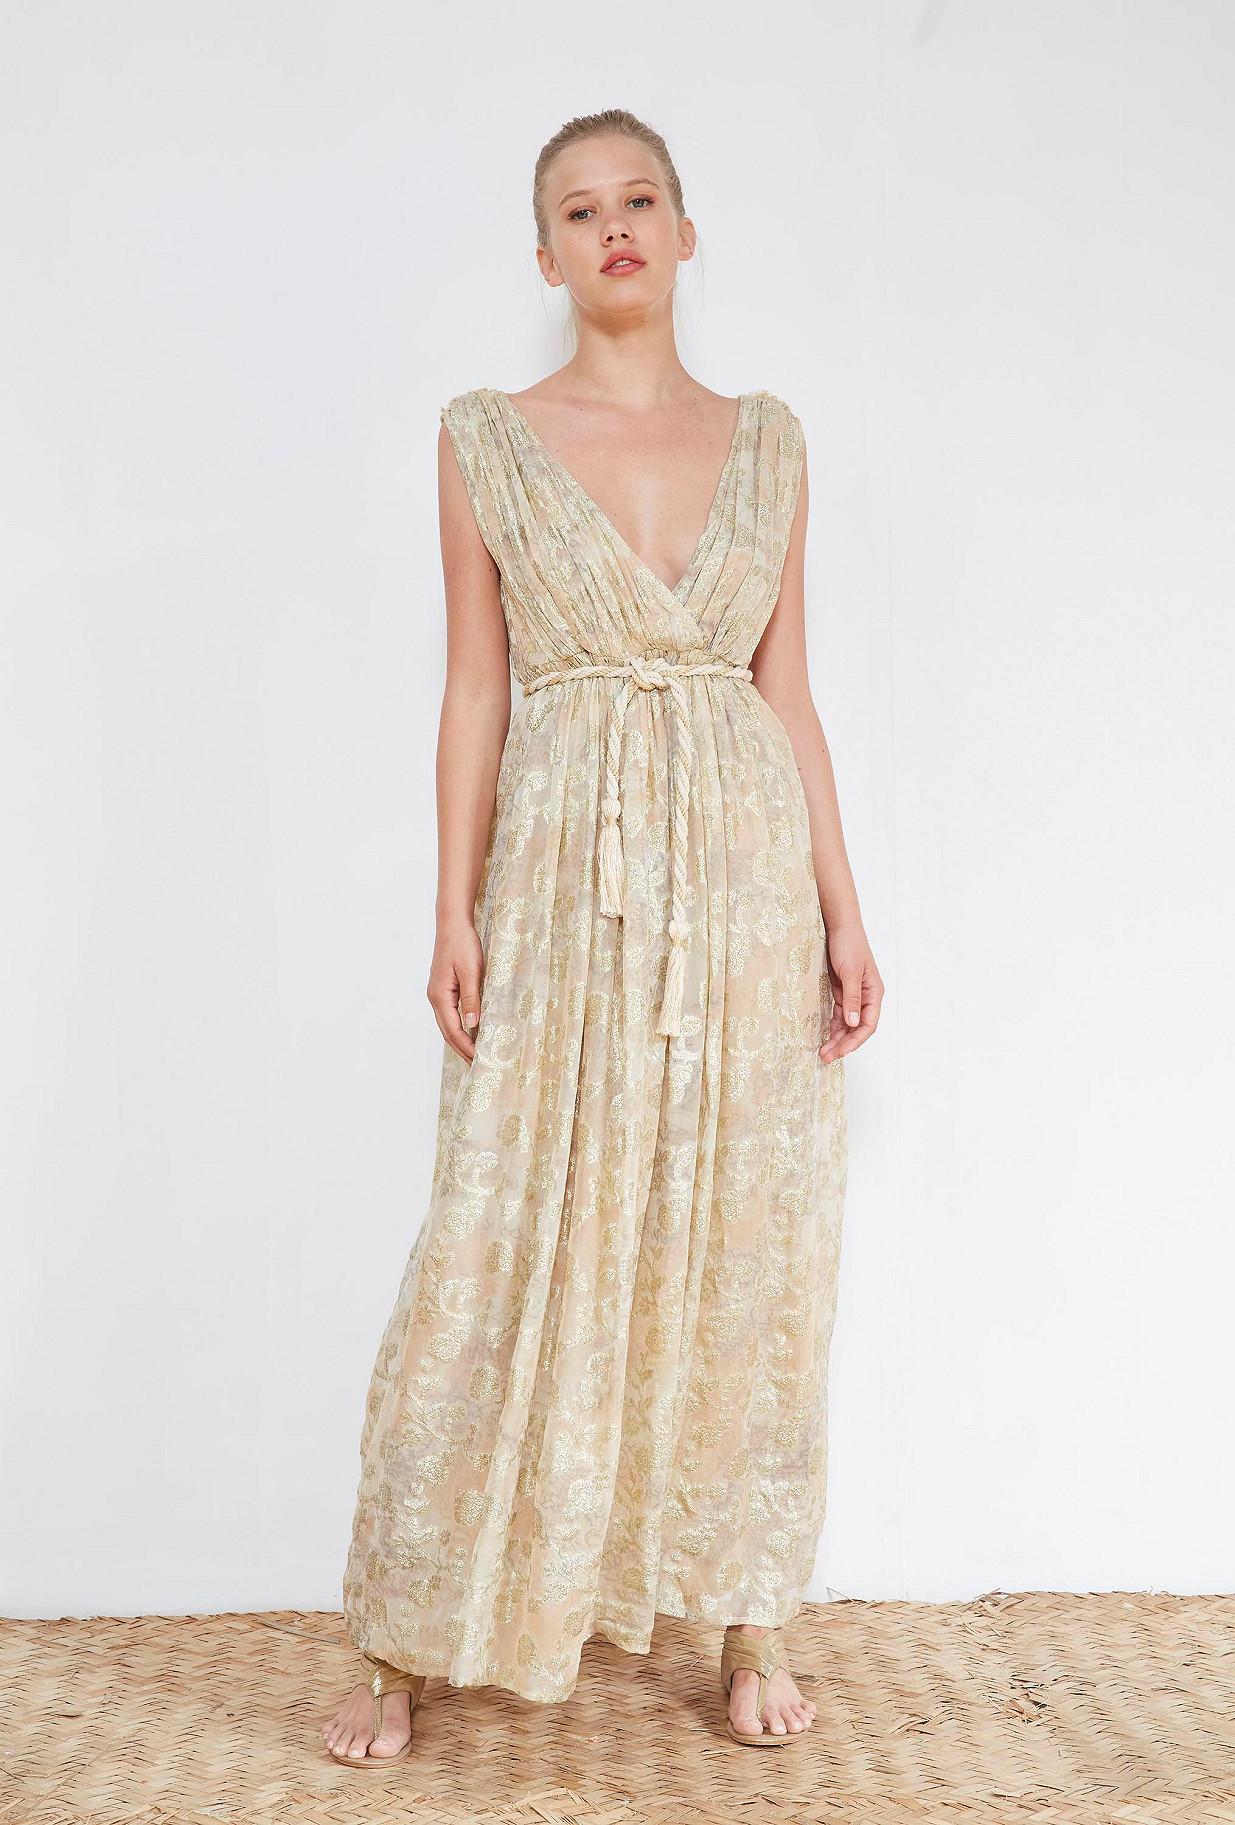 clothes store DRESS  Artem french designer fashion Paris